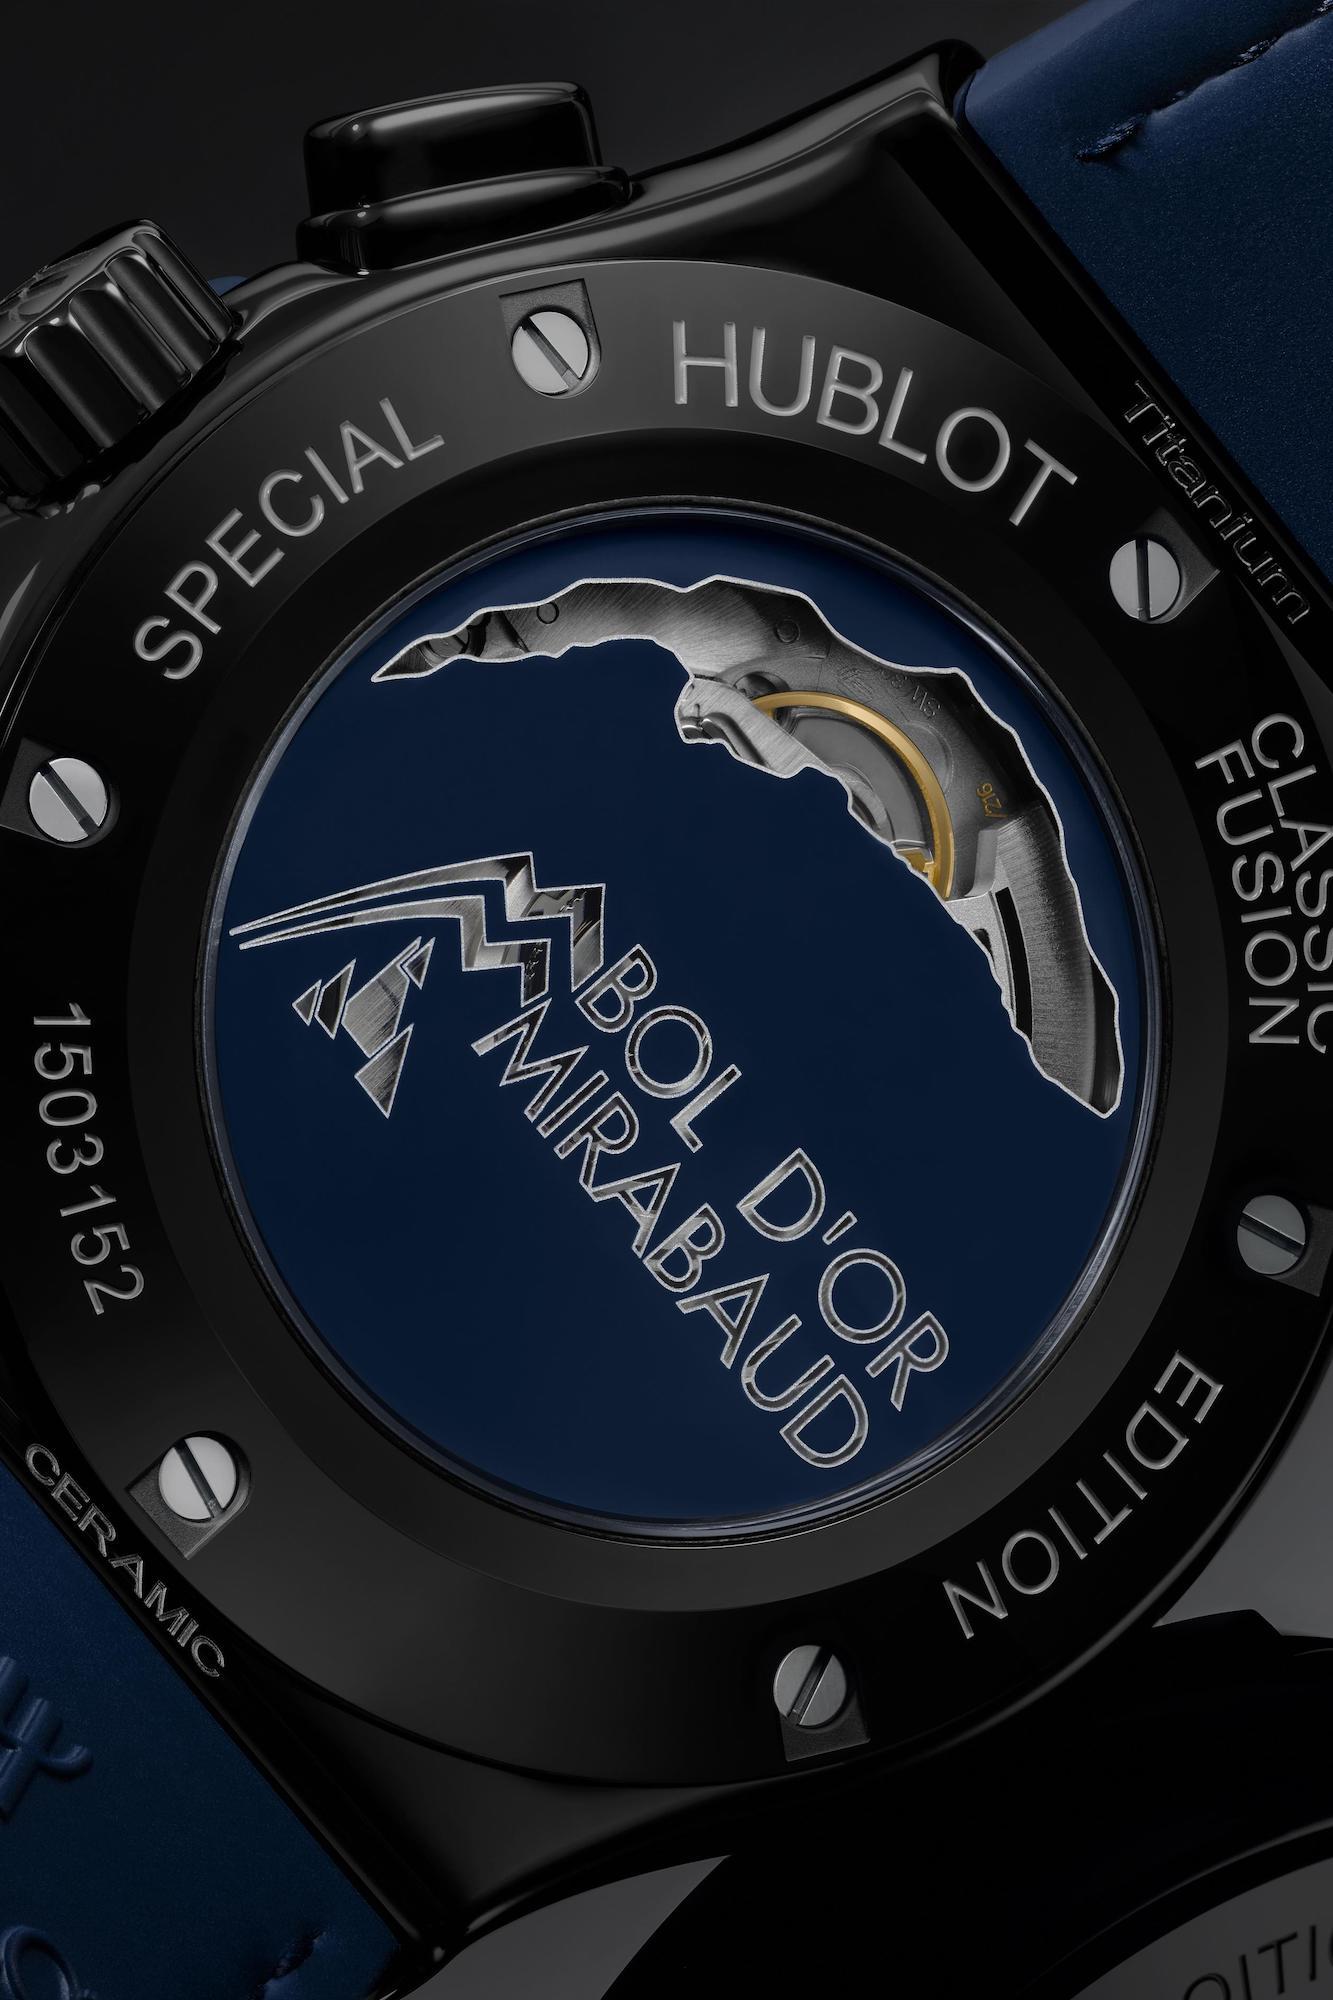 Hublot Classic Fusion Chronograph Bol d'Or Mirabaud 521.CM.7070.NR.BOM Detalle trasera